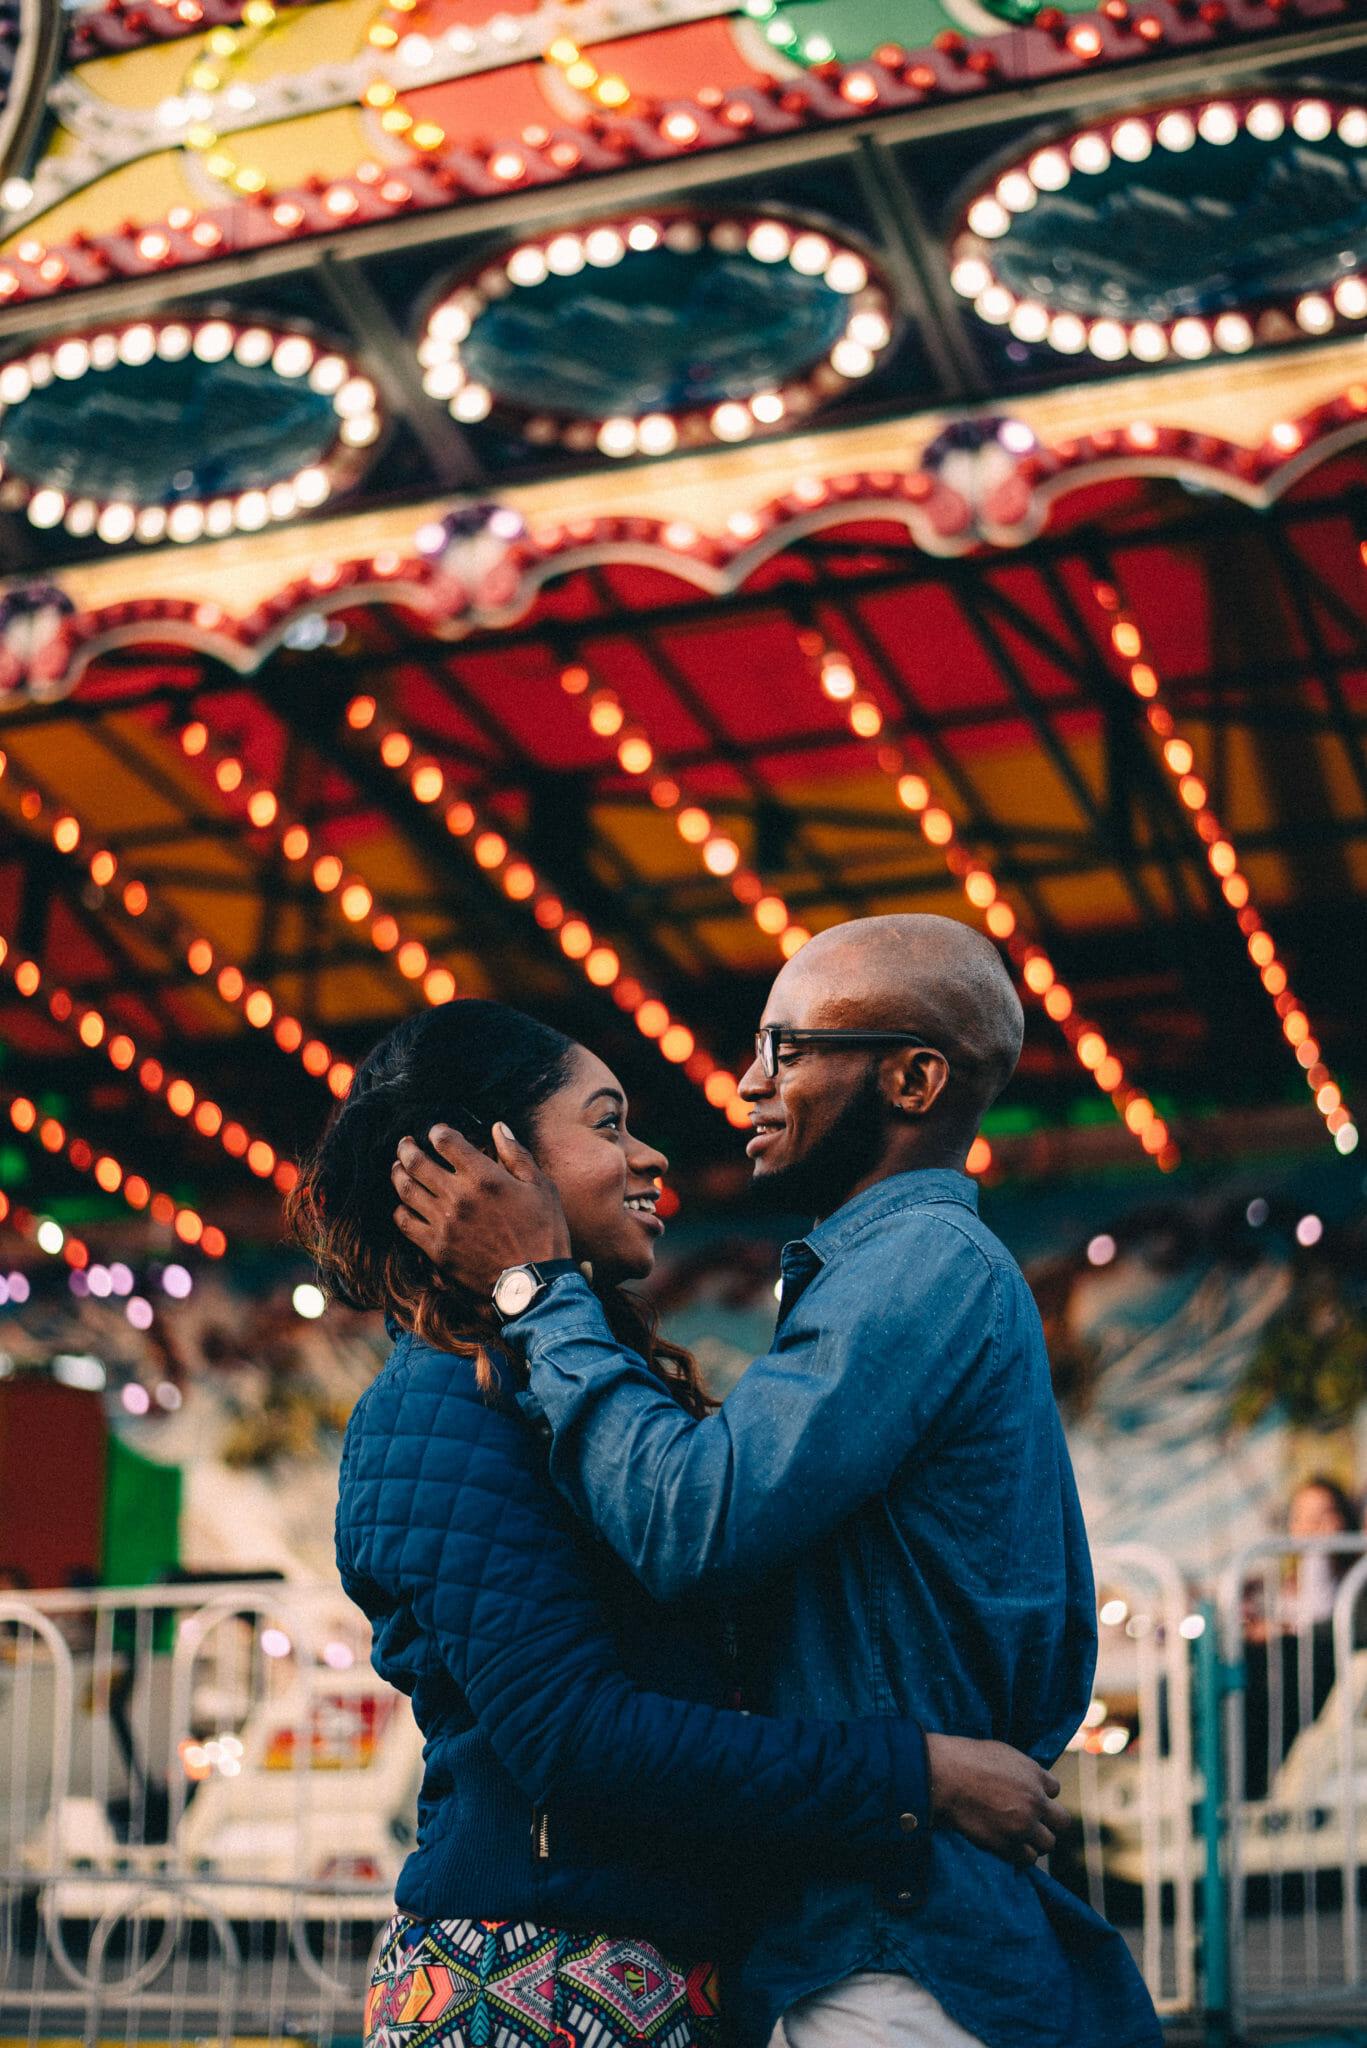 engagement photos at spring fair